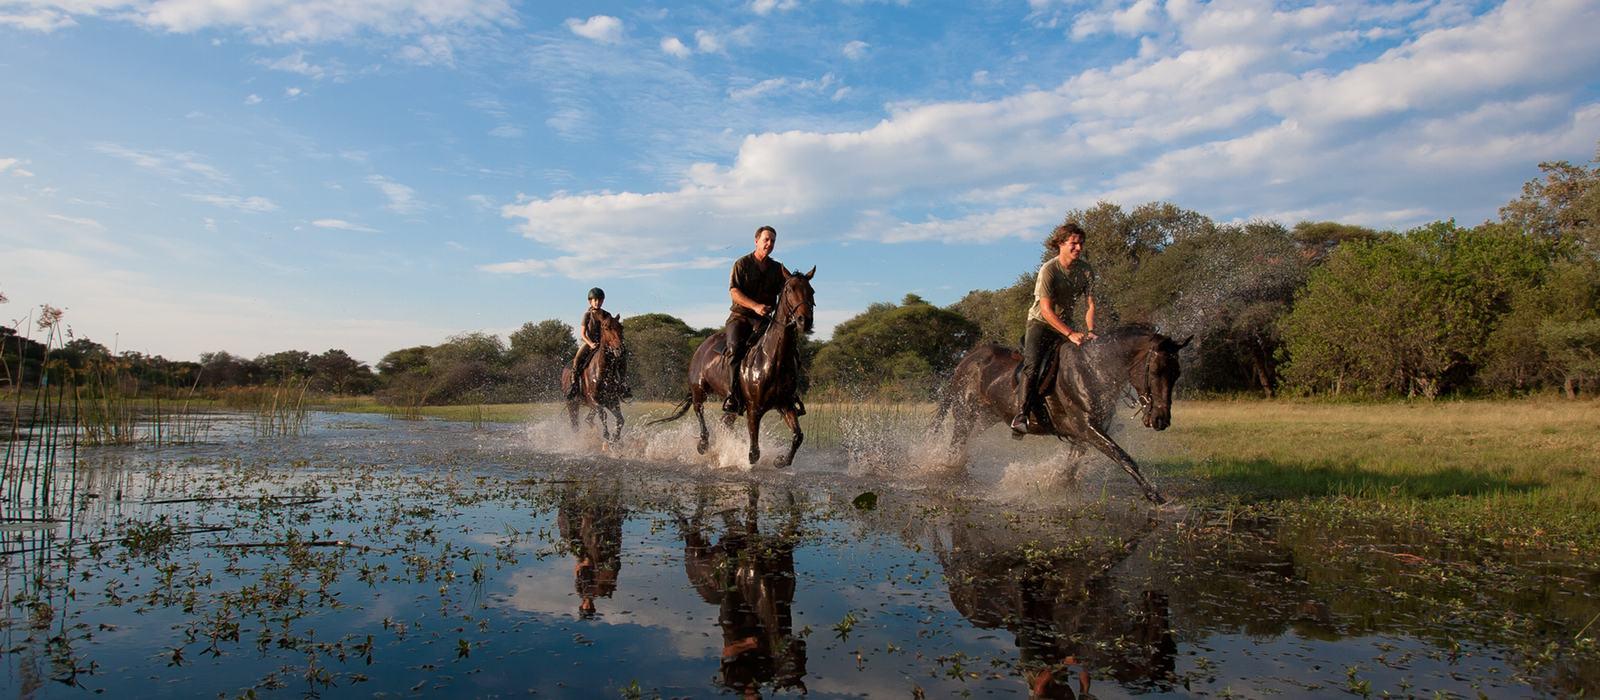 Thamalakane River gallop on horseback